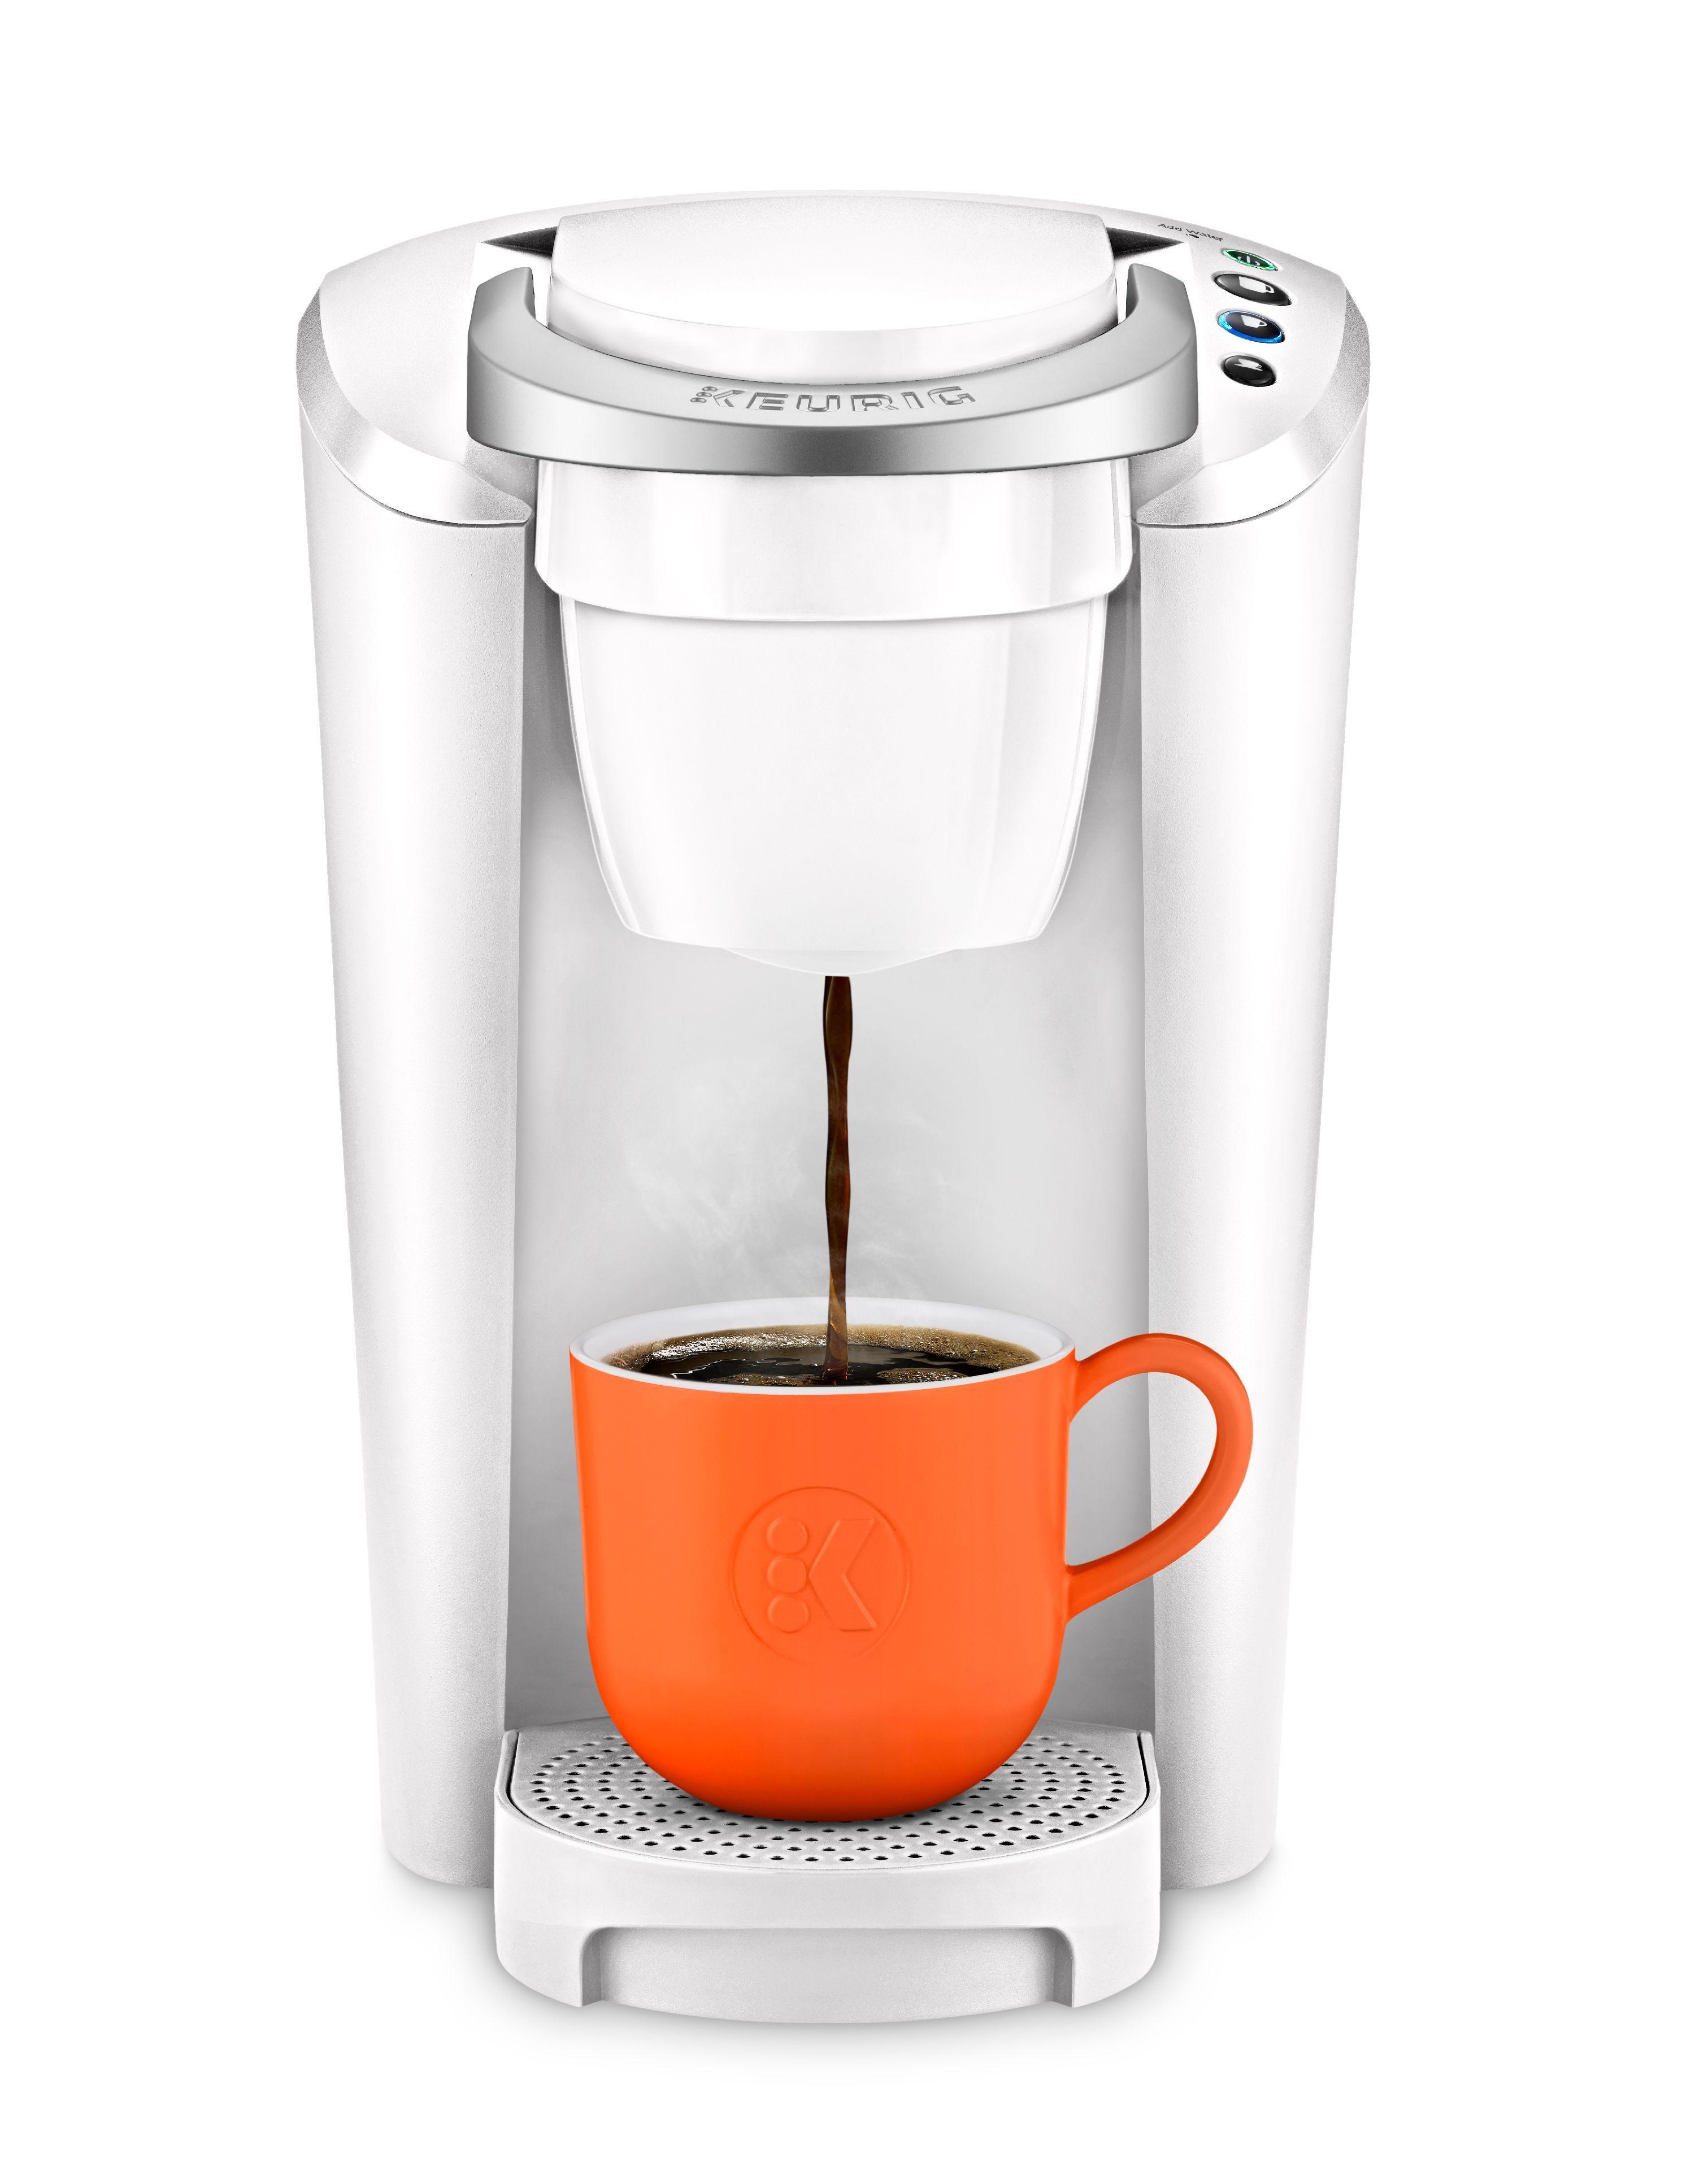 Keurig SingleServe KCup Pod Coffee Maker